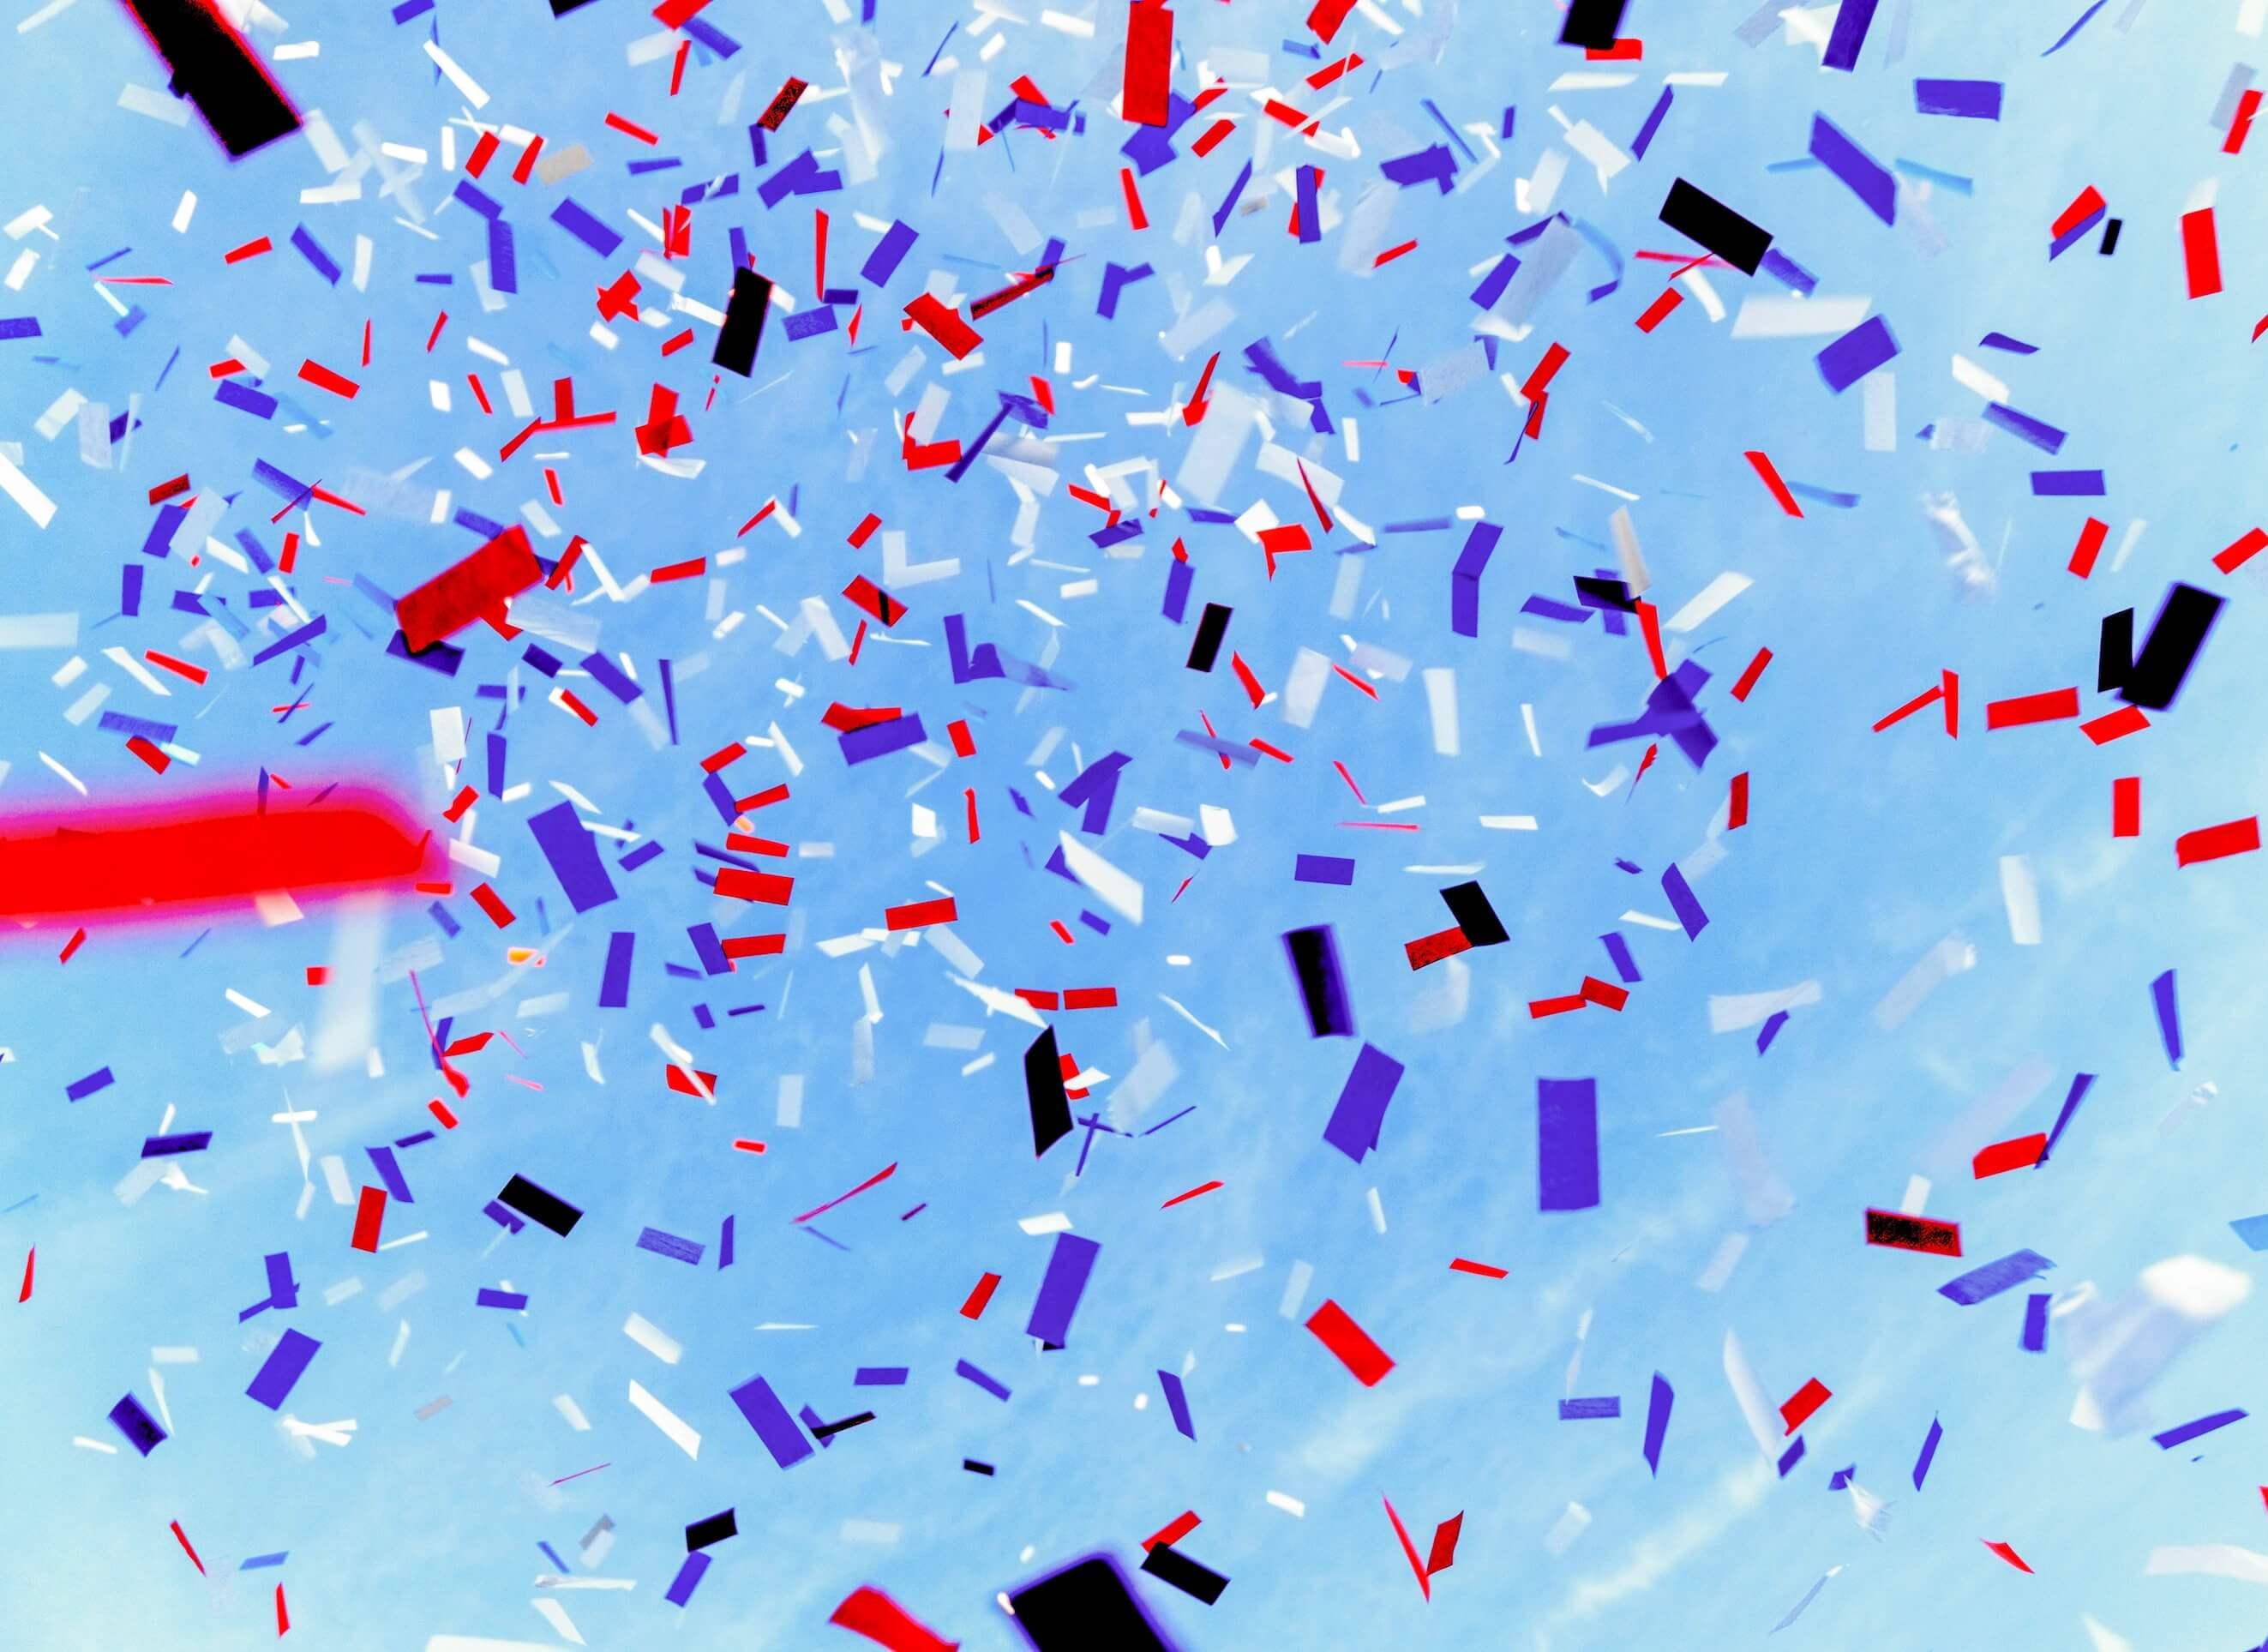 Red, white, and blue confetti